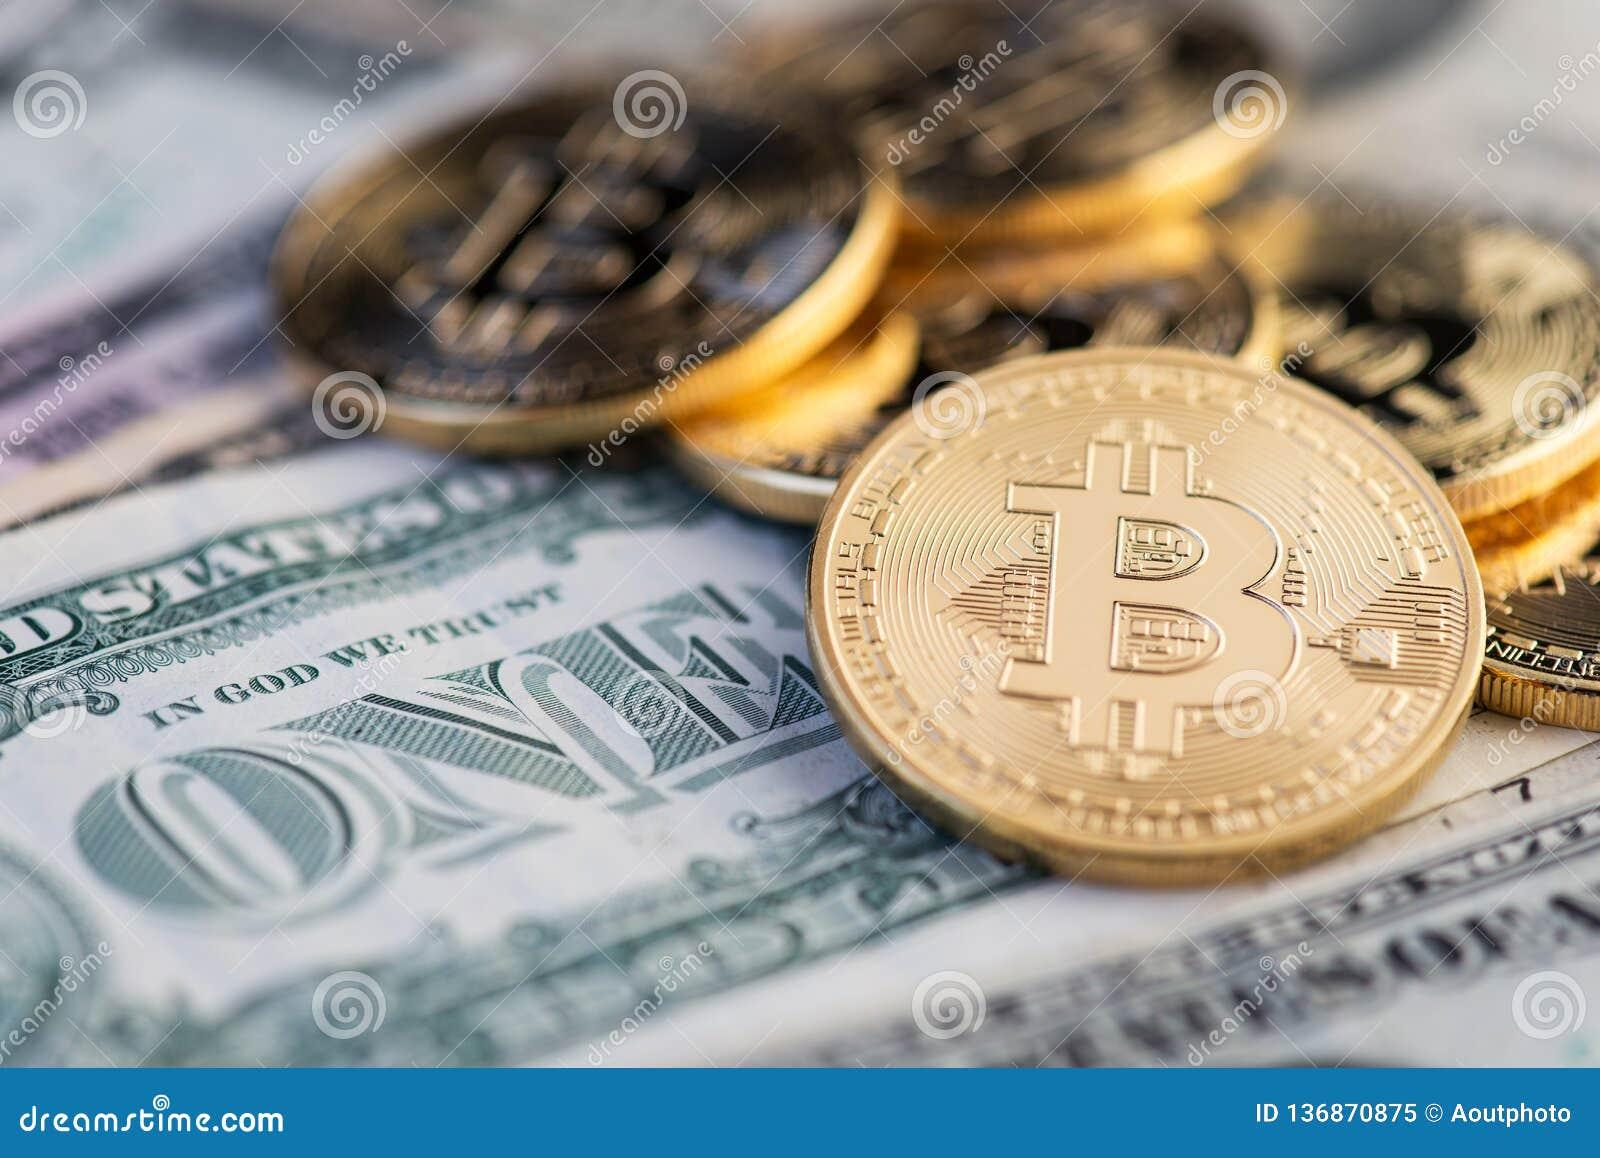 bitcoin cash exchange usa